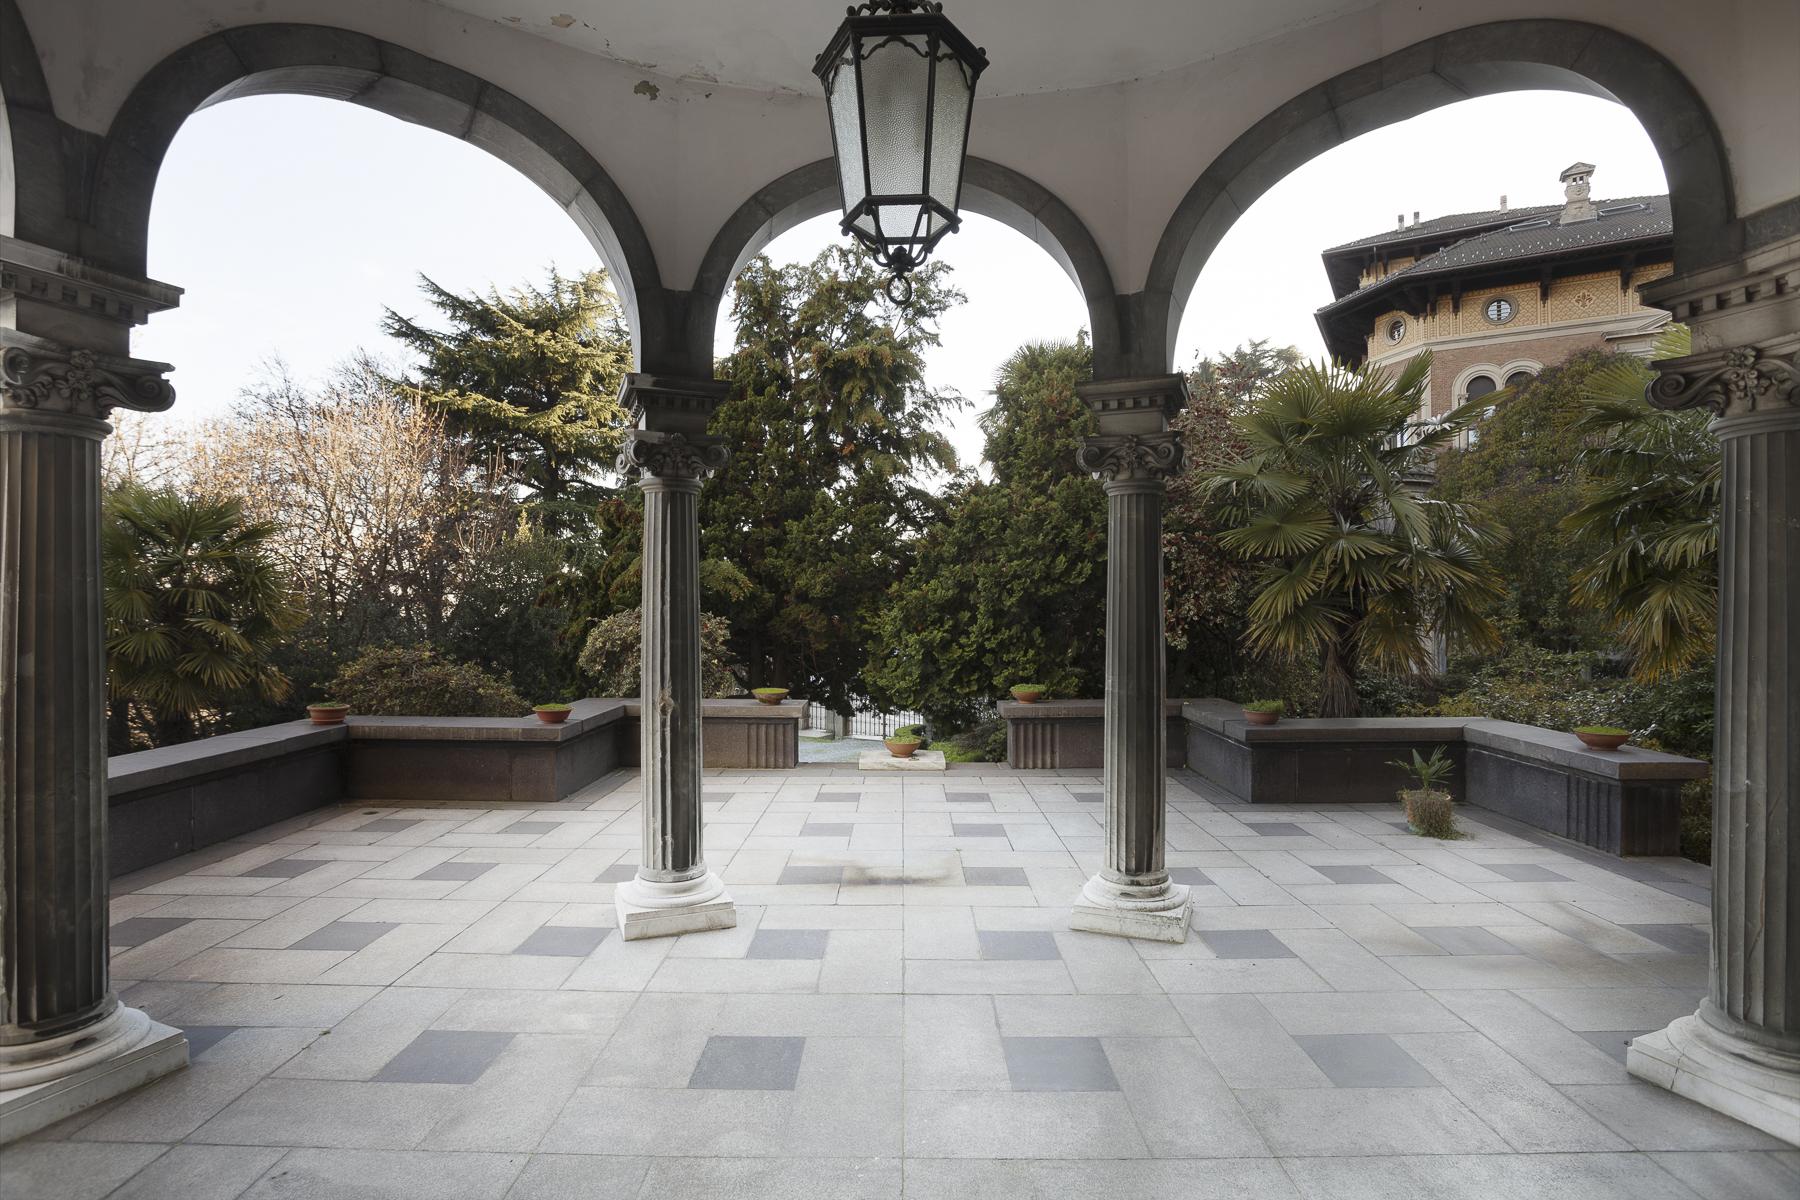 Additional photo for property listing at Beautiful Liberty Style Villa Via Galileo Galilei Biella, Biella 15900 Italia